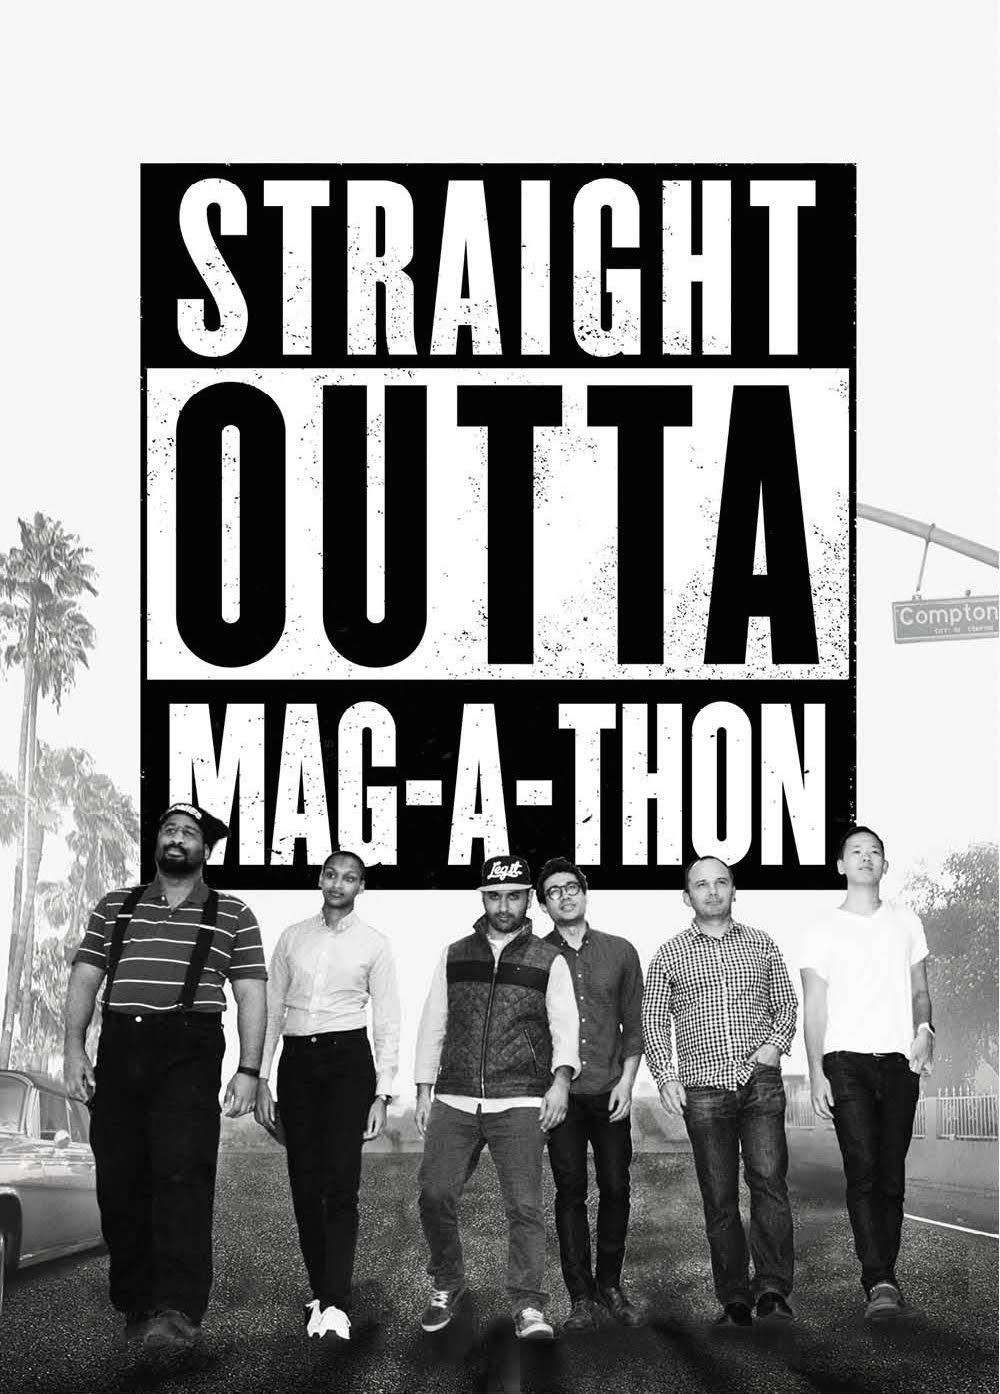 MAG-A-THON Trailer Image